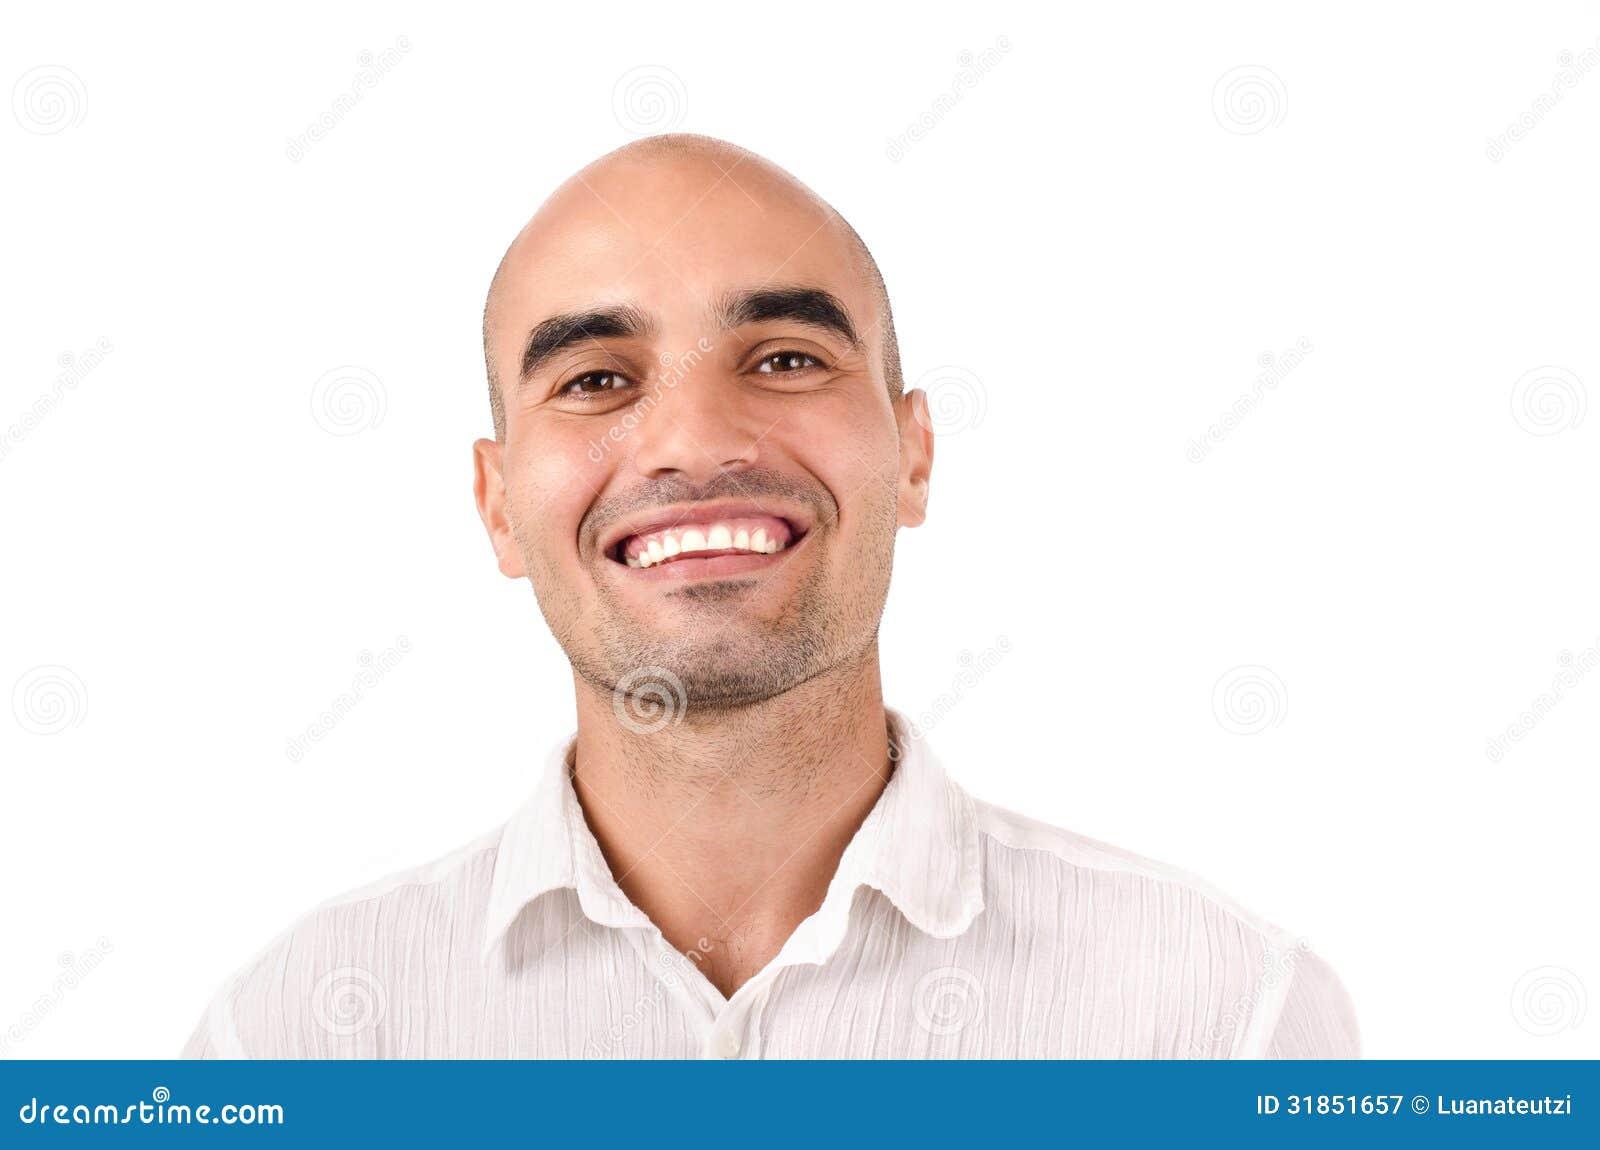 Attractive men with beards